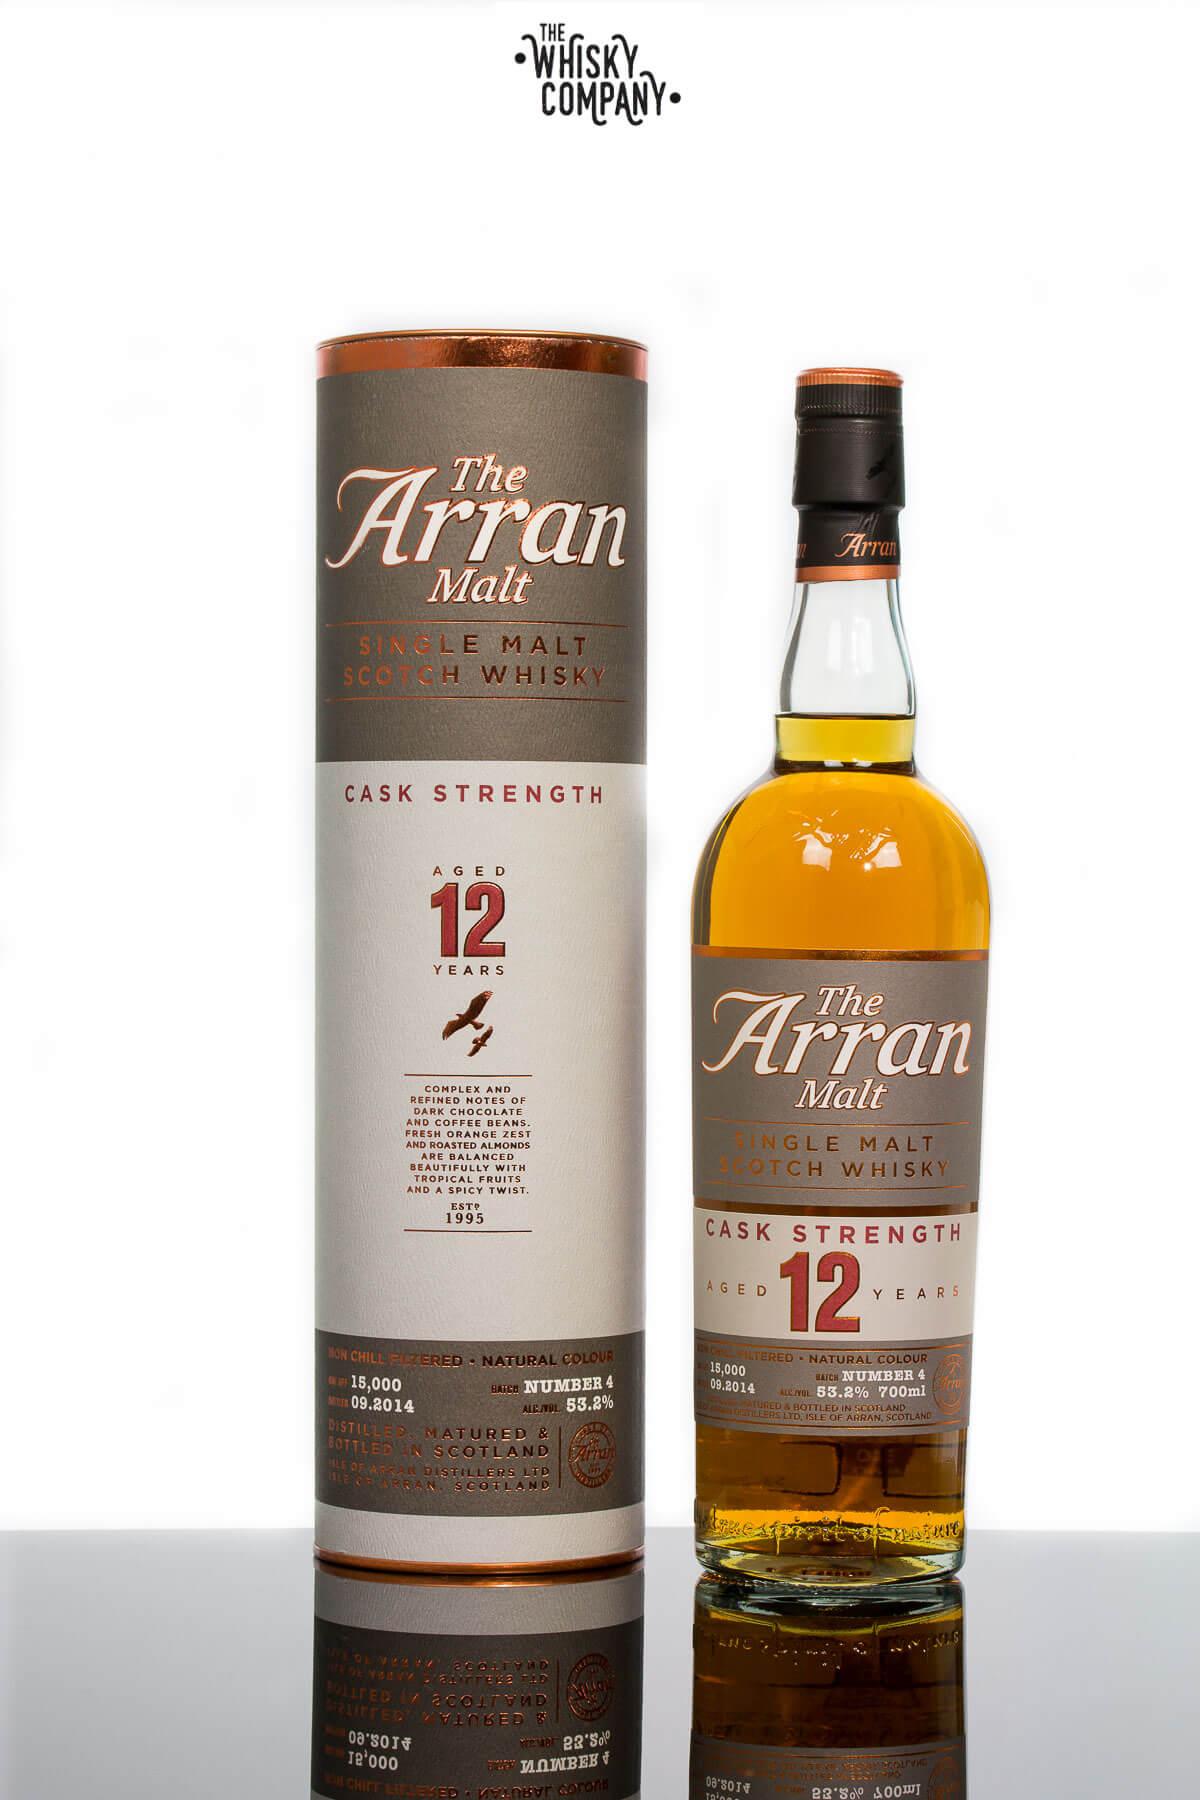 Arran Aged 12 Years Cask Strength Island Single Malt Scotch Whisky (700ml)